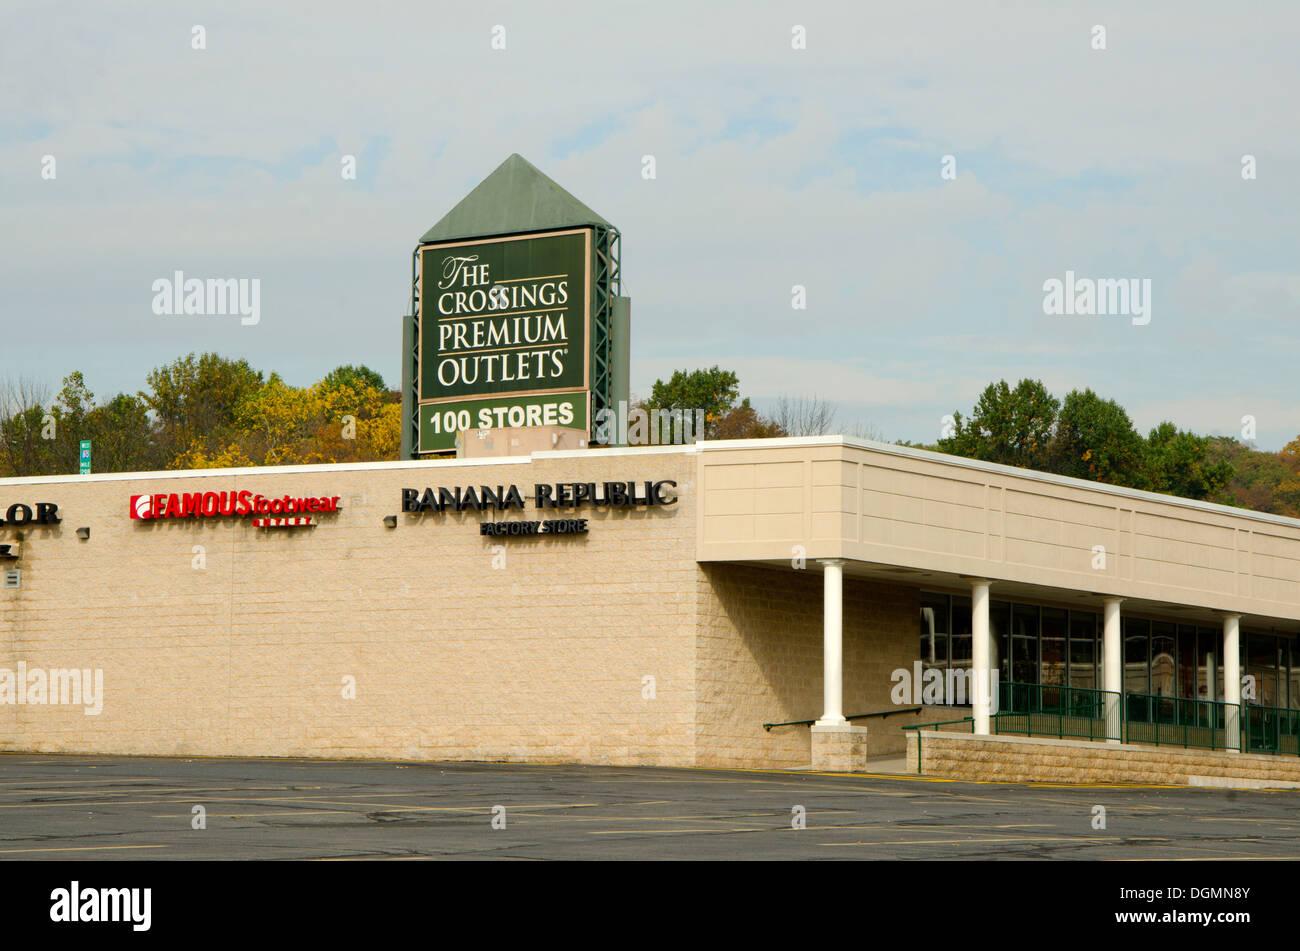 Die Kreuzungen Premium Outlets in den Pocono-pennsylvania Stockbild